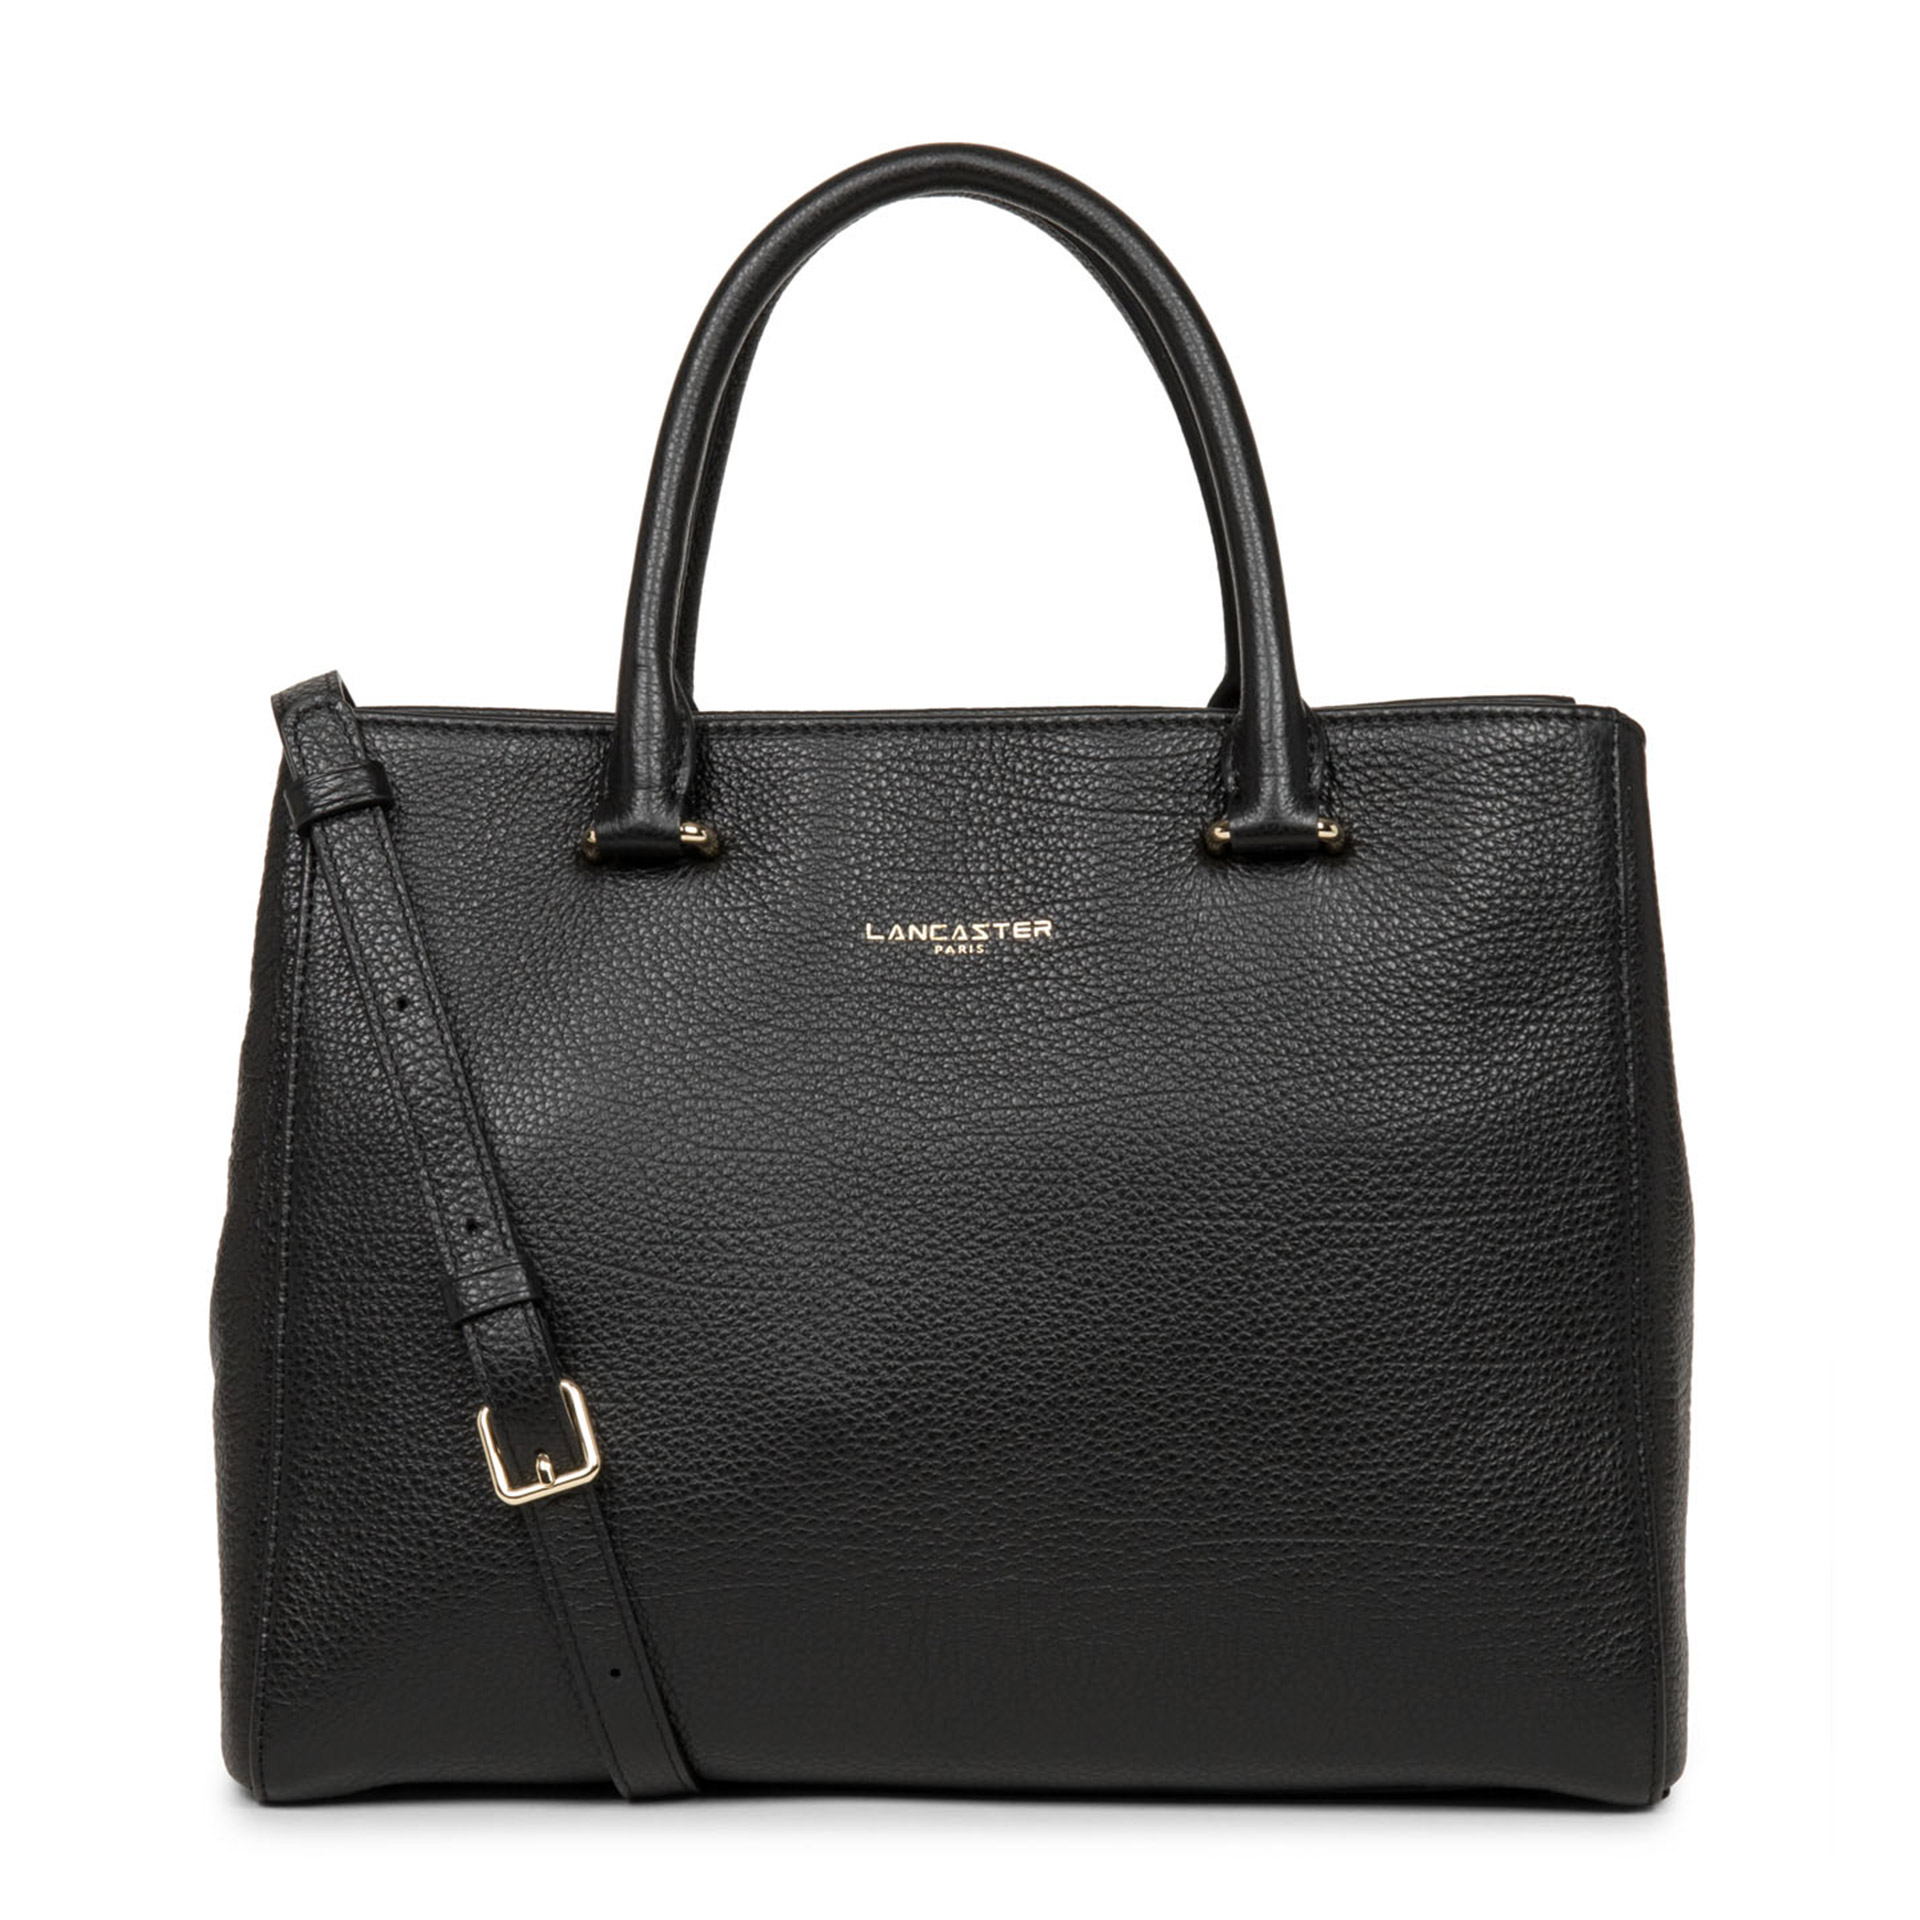 Lancaster Paris Dune Handtasche noir